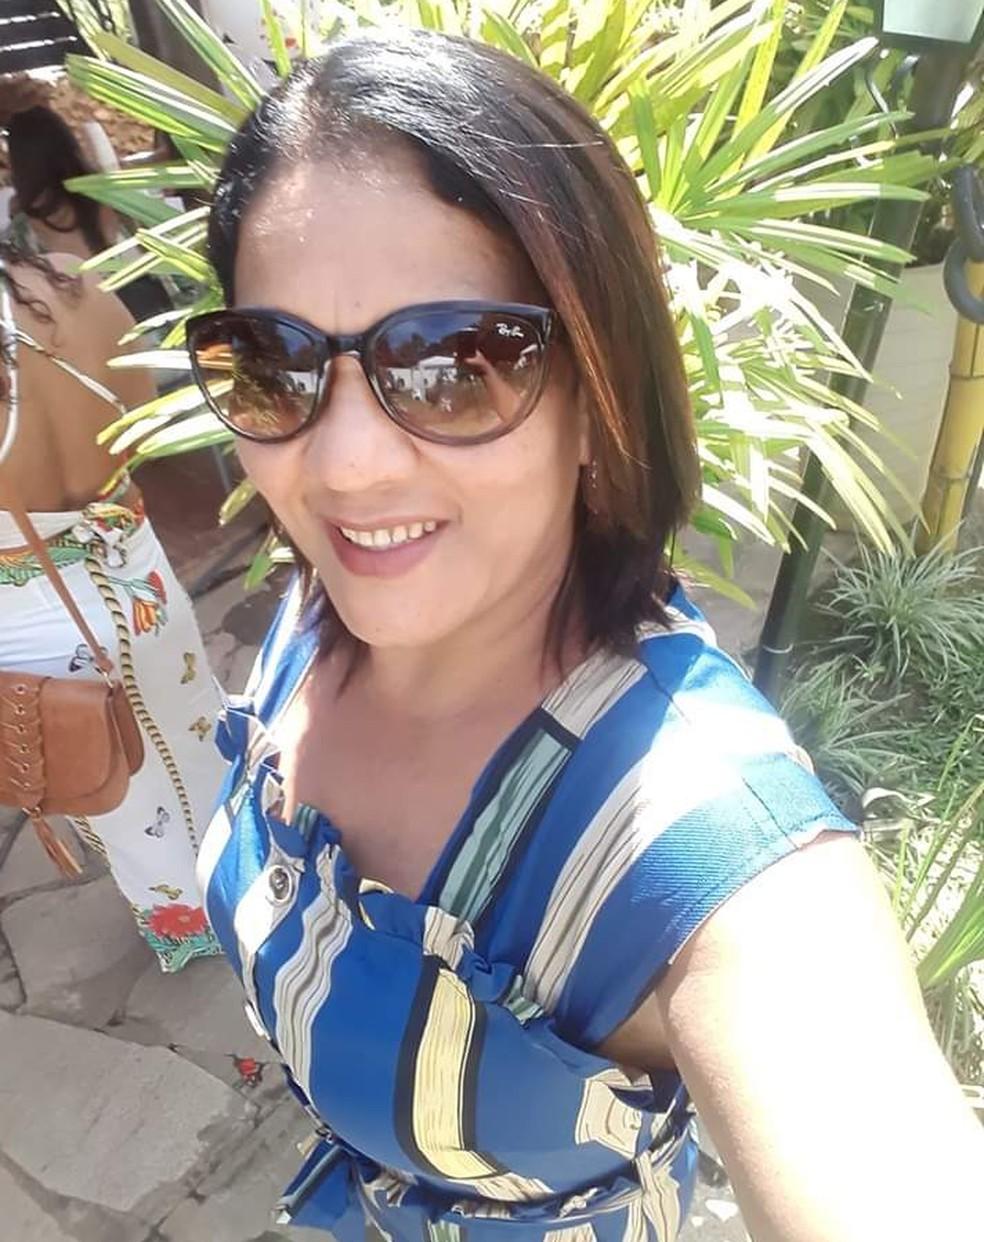 Marilene Marins de Melo Neves foi morta dentro da igreja — Foto: Redes Sociais